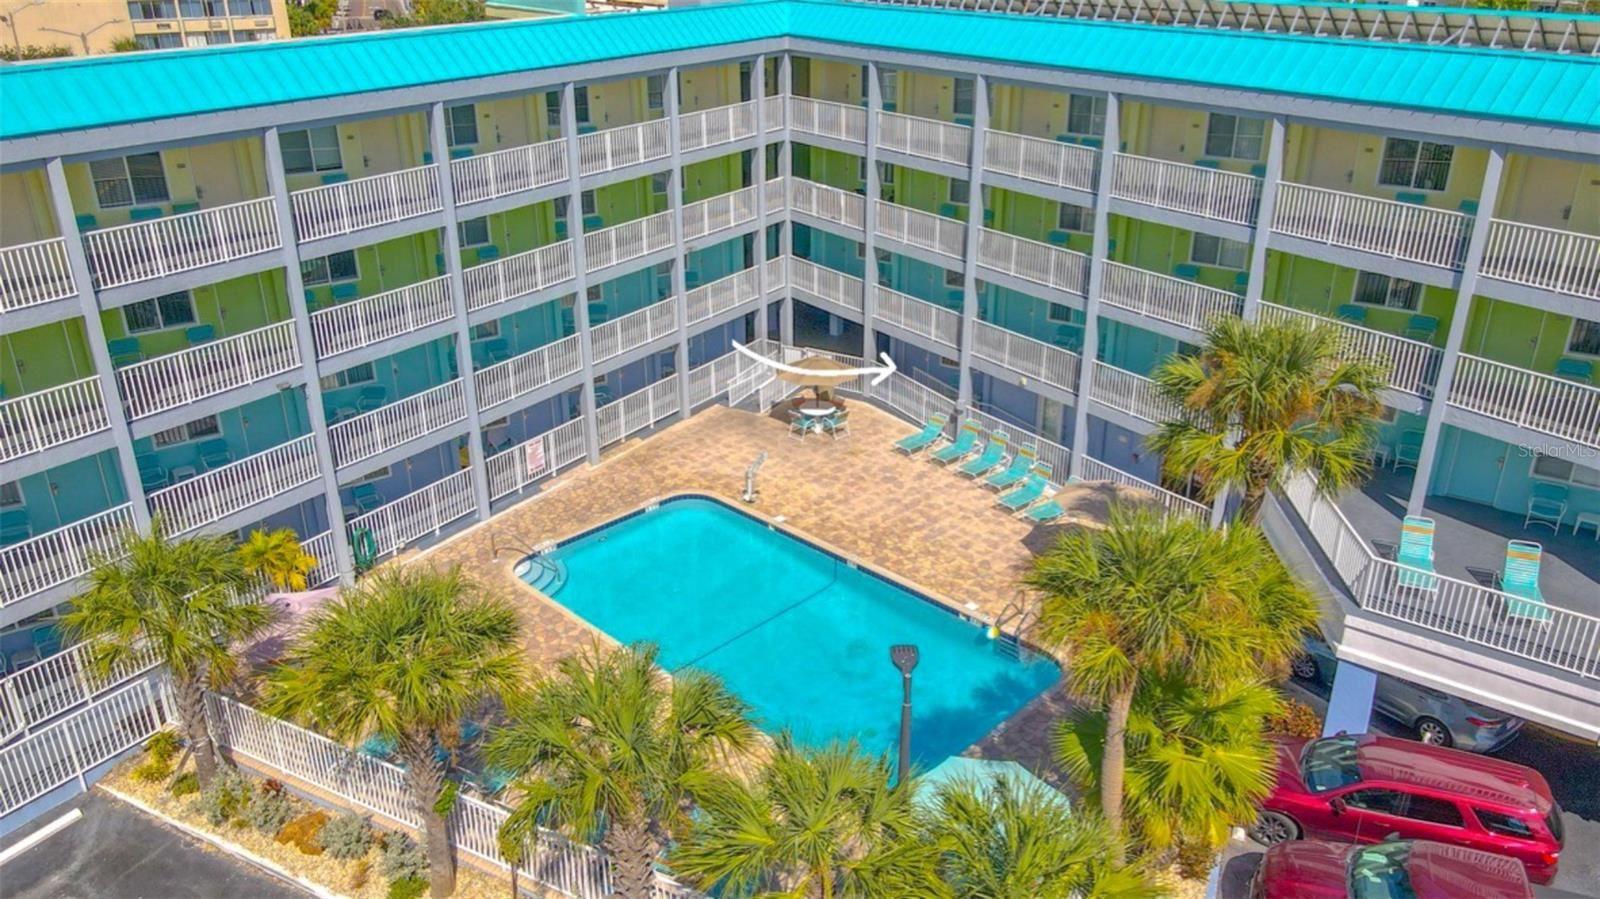 445 S GULFVIEW BOULEVARD #123, Clearwater, FL 33767 - MLS#: U8140160